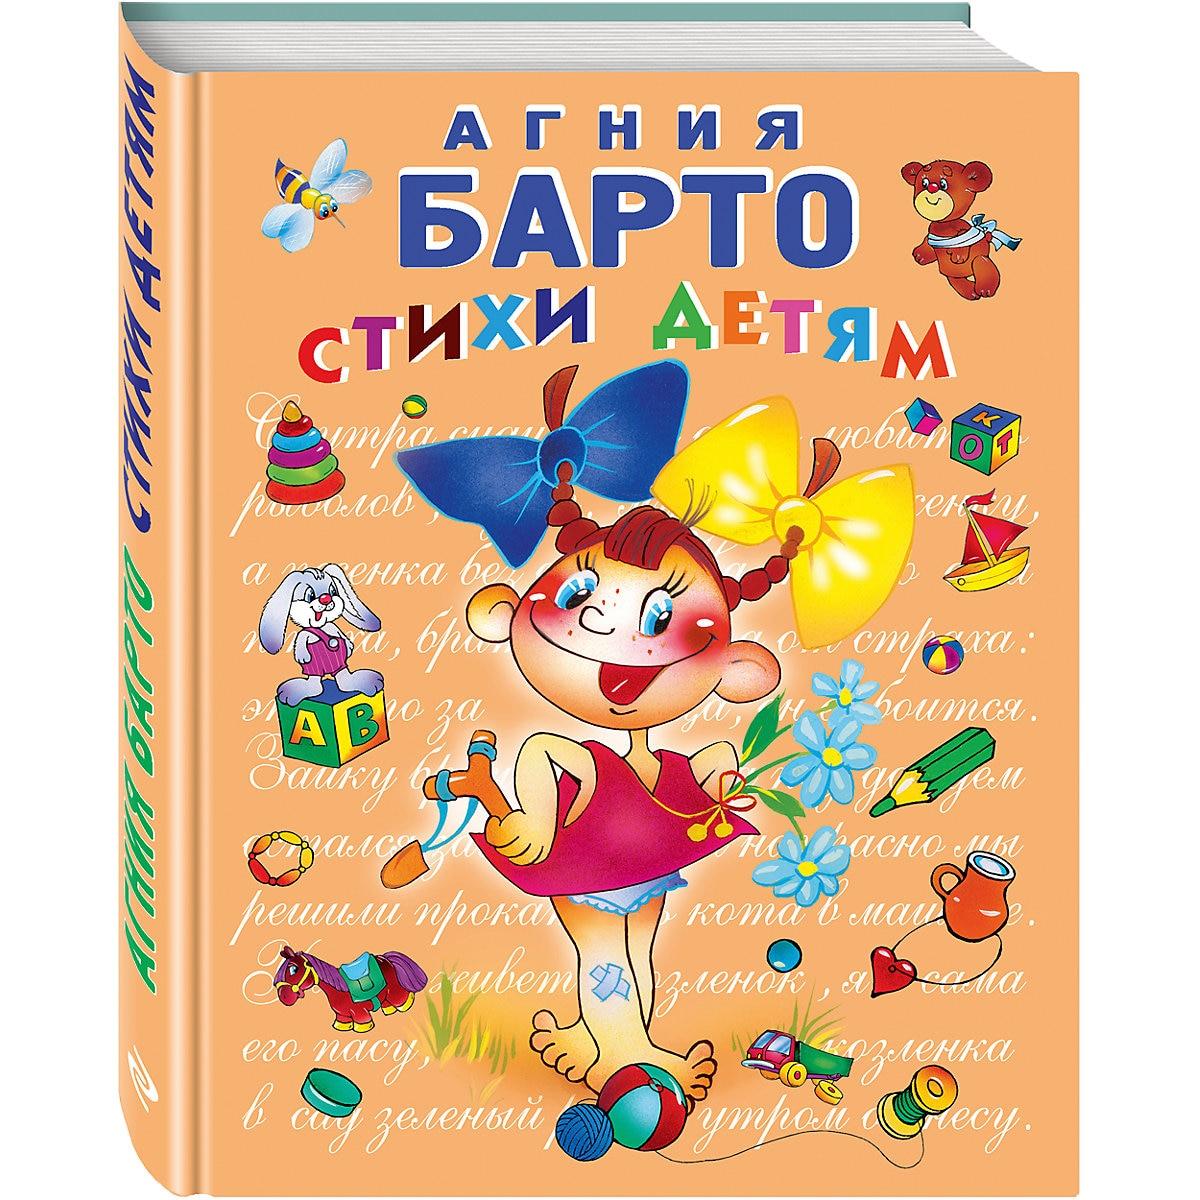 Books EKSMO 6878078 Children Education Encyclopedia Alphabet Dictionary Book For Baby MTpromo